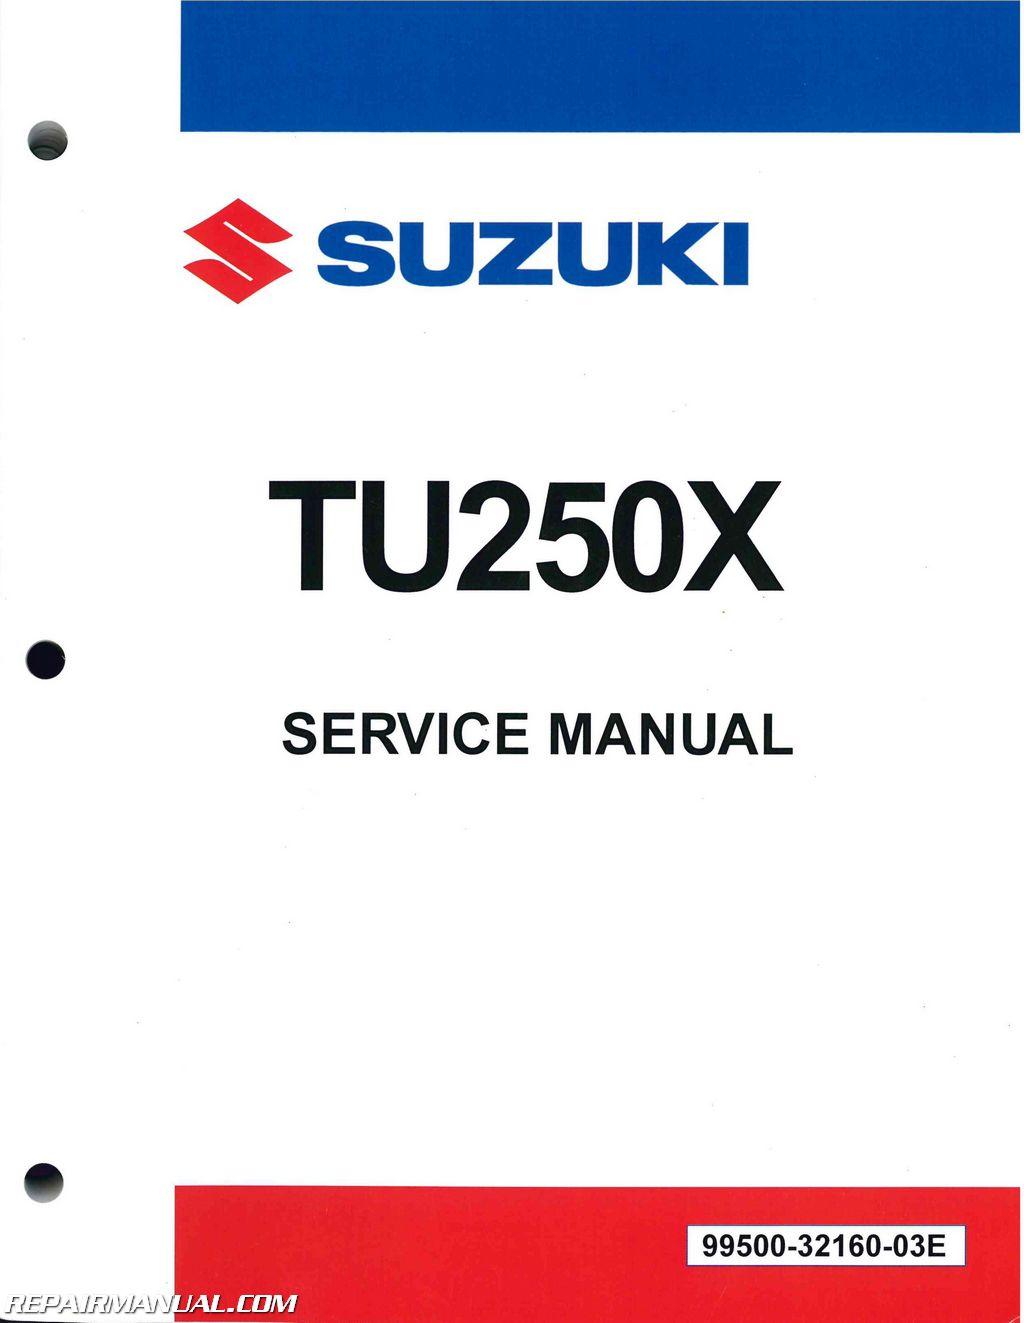 2017 Suzuki TU250X Motorcycle Service Manual